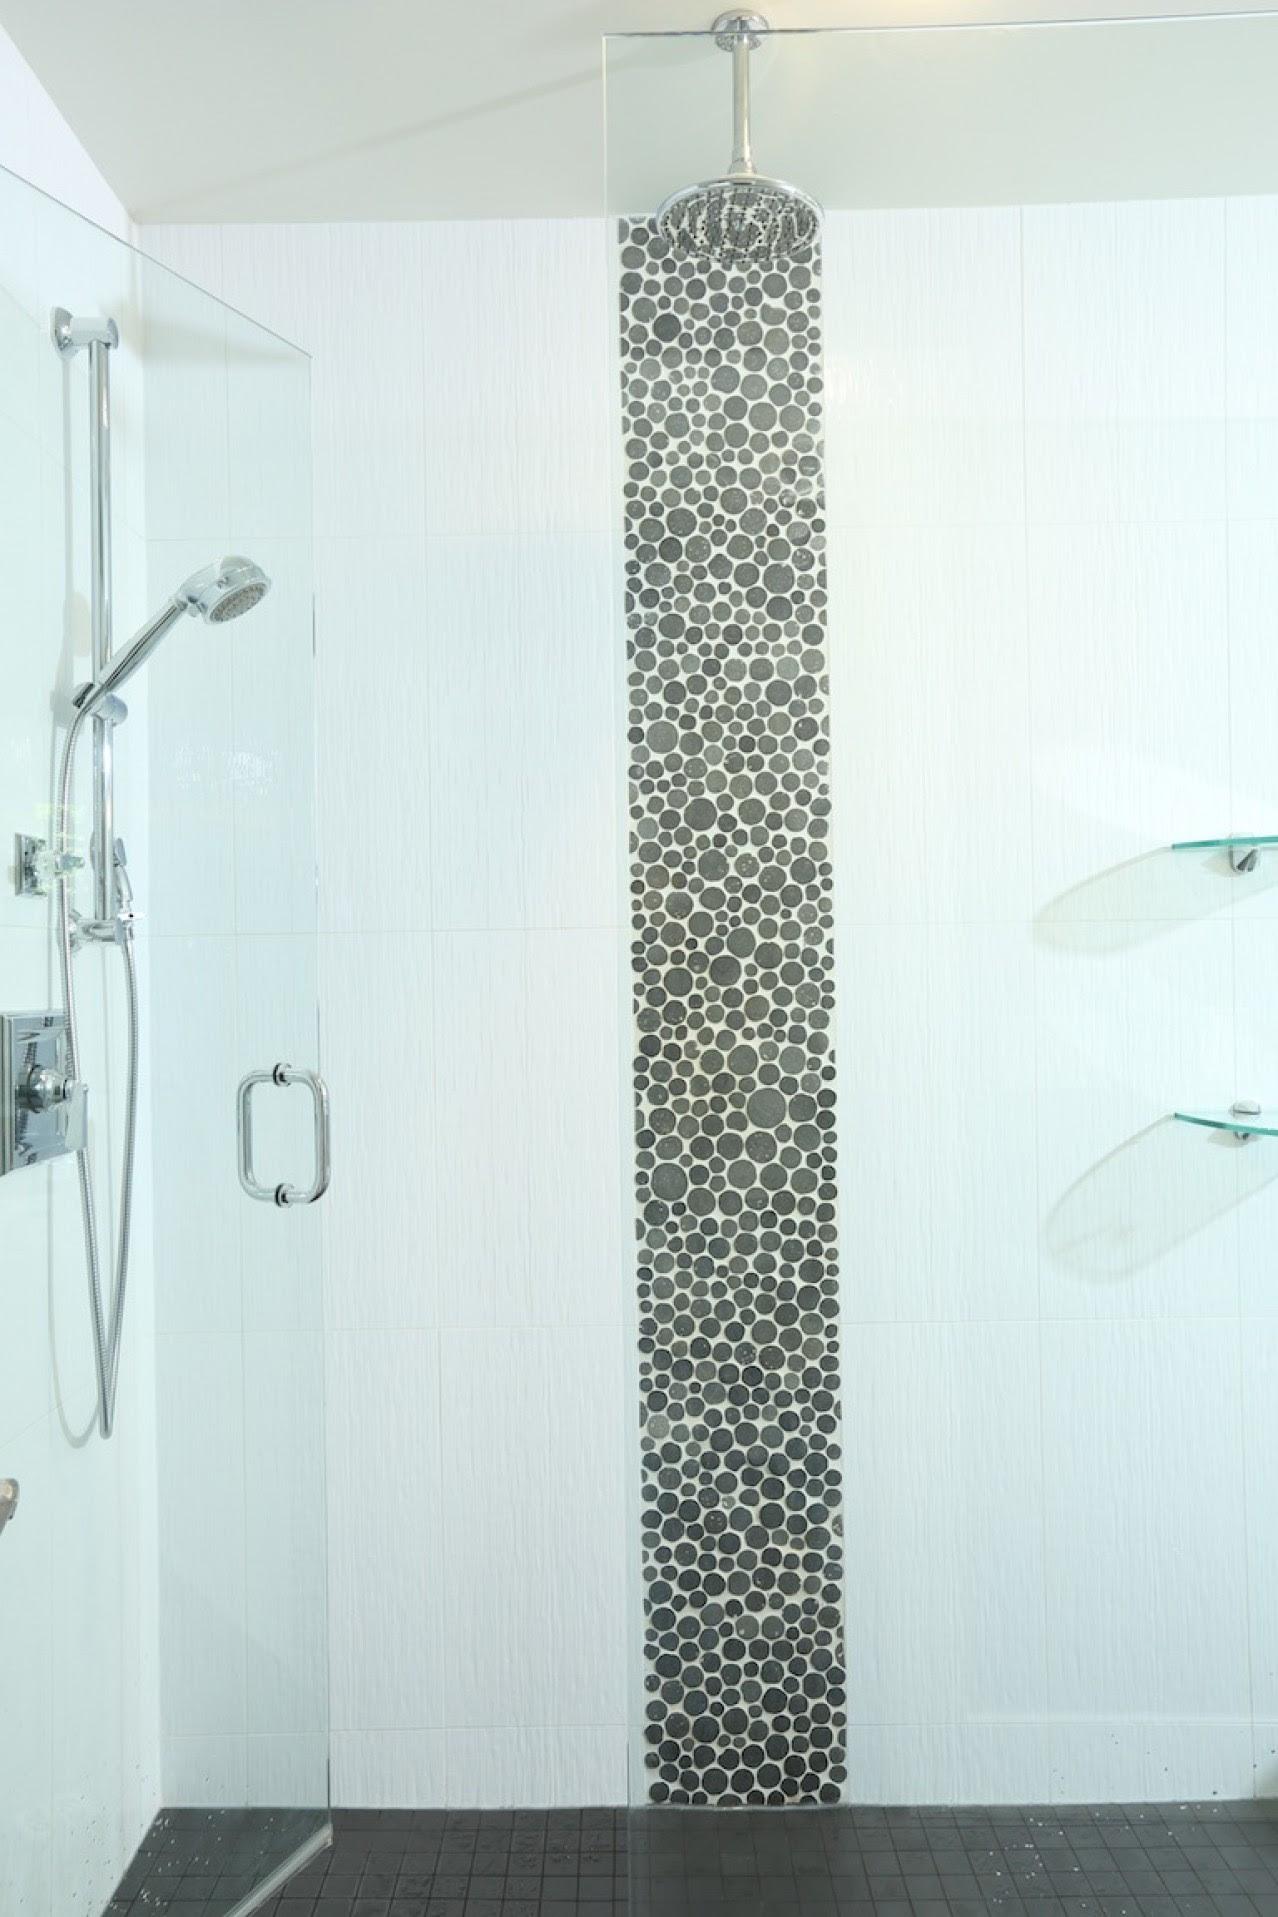 SetWidth1278 Sinclair North Shore Custom Built Ensuite Shower with Custom Tile Work Rain Shower